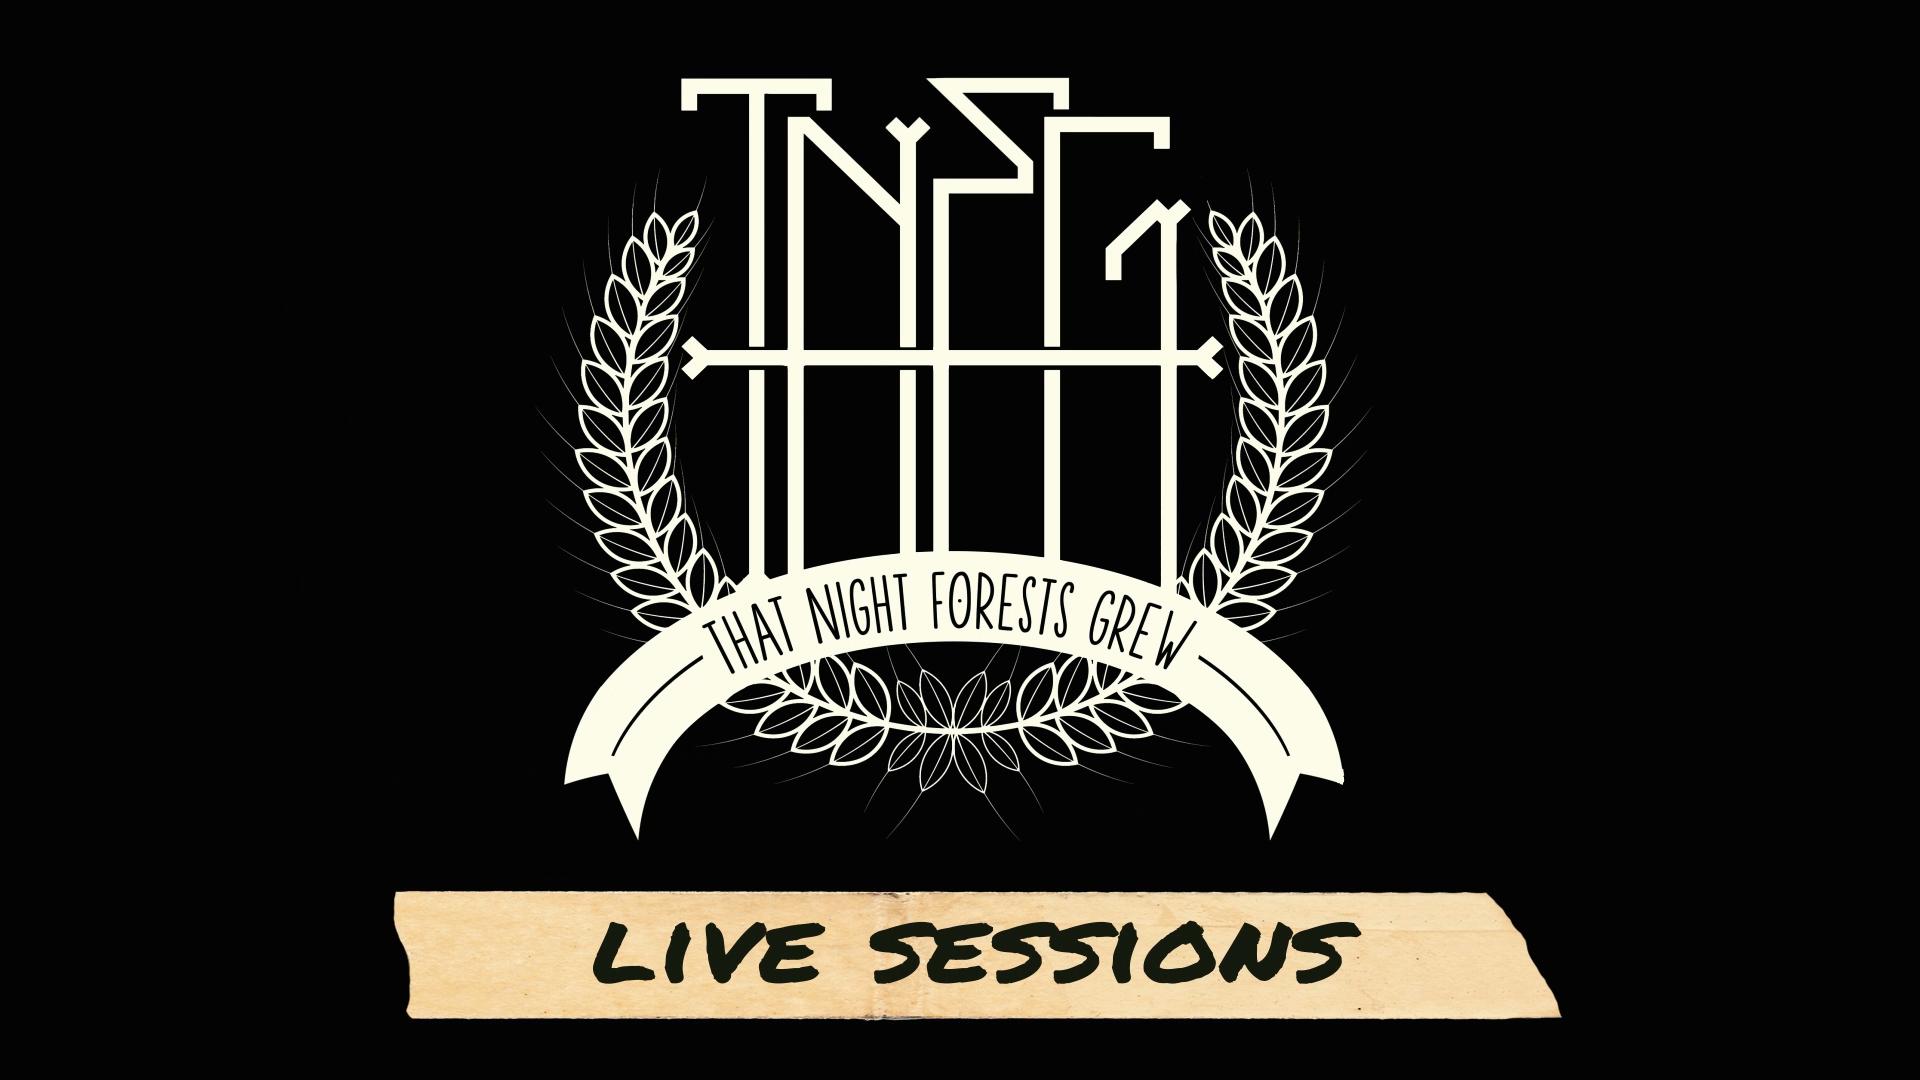 TNFG Tour Vid.00_00_10_23.Still001.png